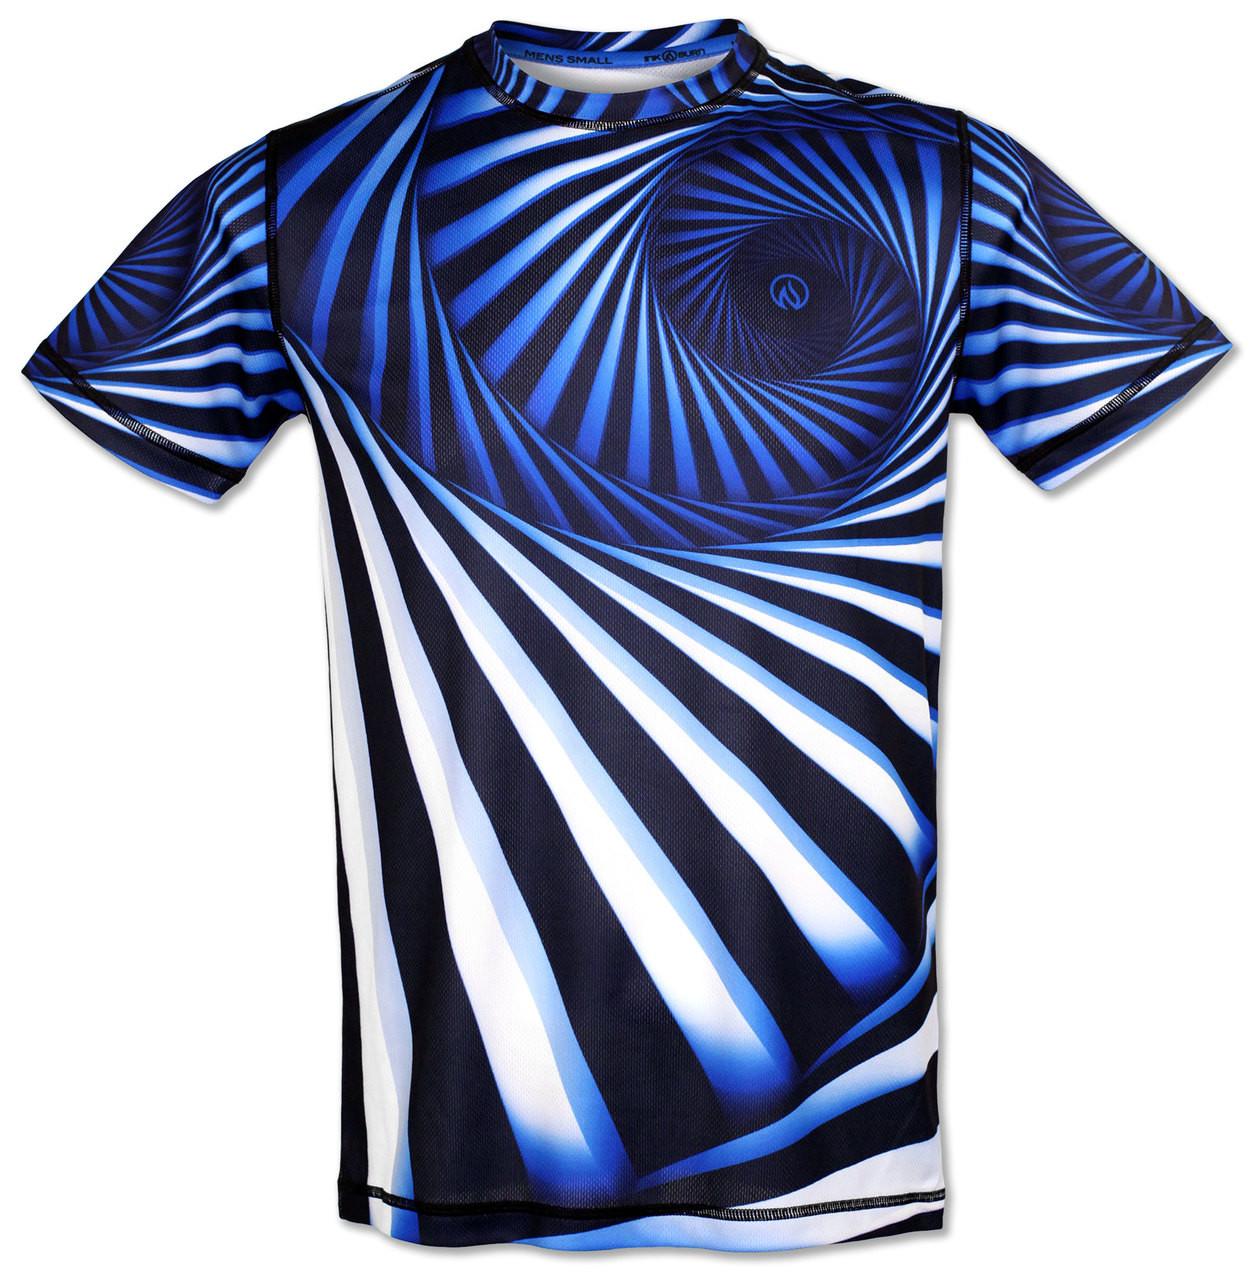 INKnBURN Men's Hypnotic Tech Shirt Front